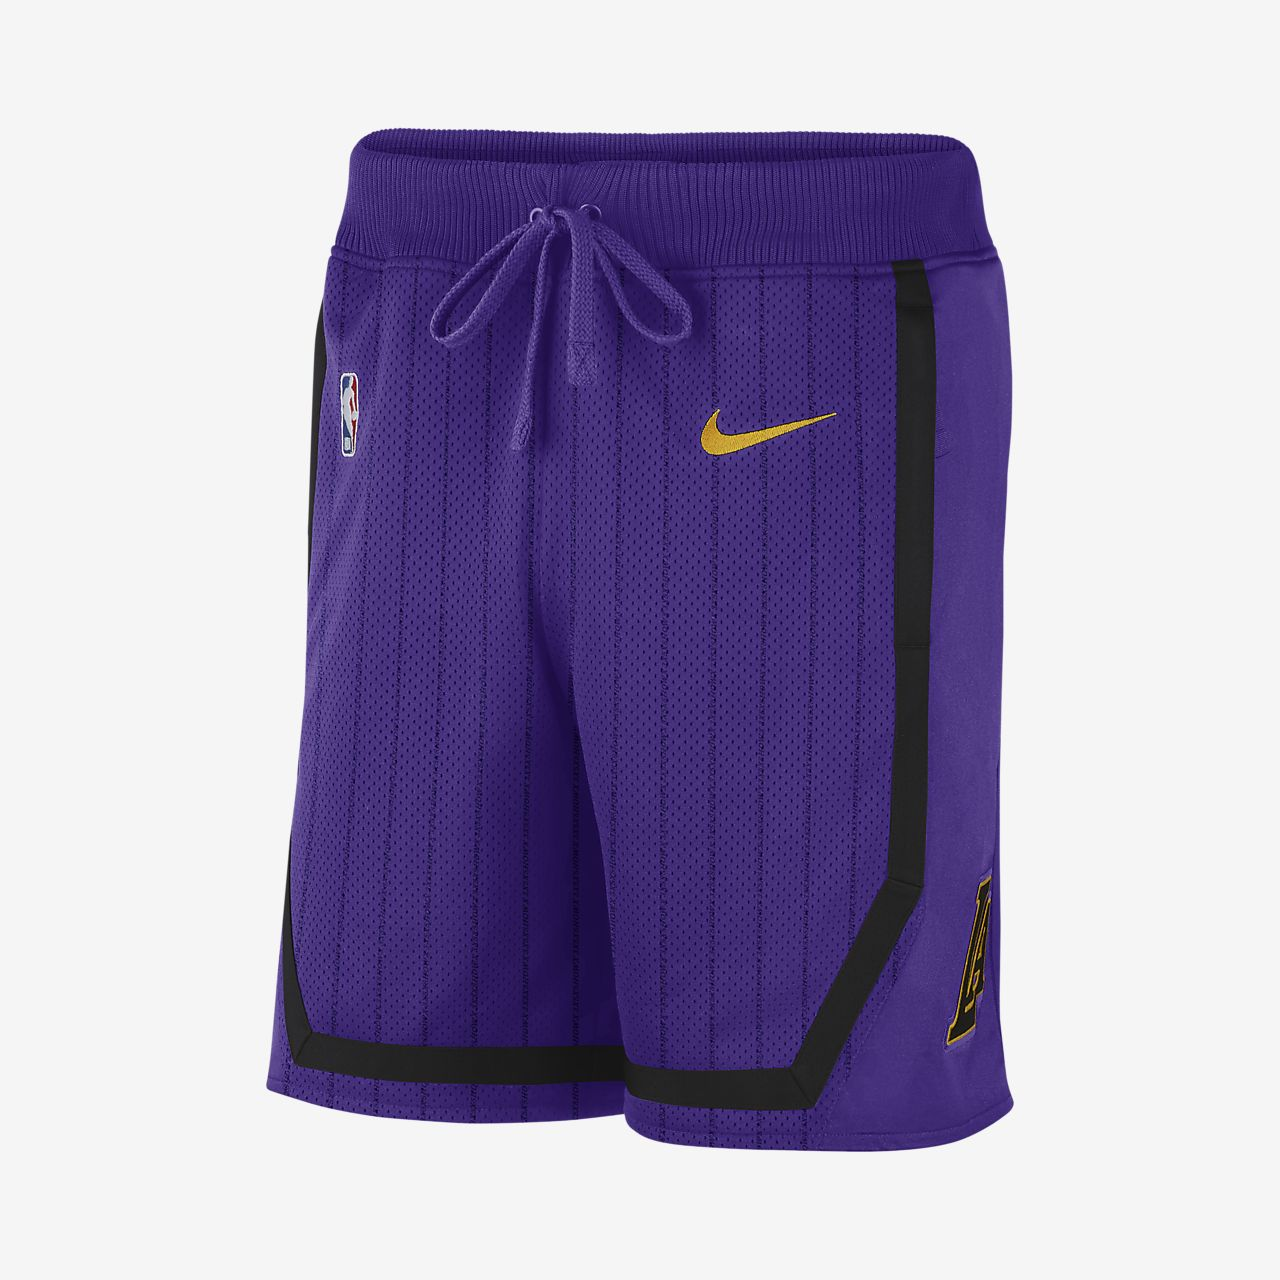 acc65917f61 Los Angeles Lakers Nike Courtside Men s NBA Shorts. Nike.com AU